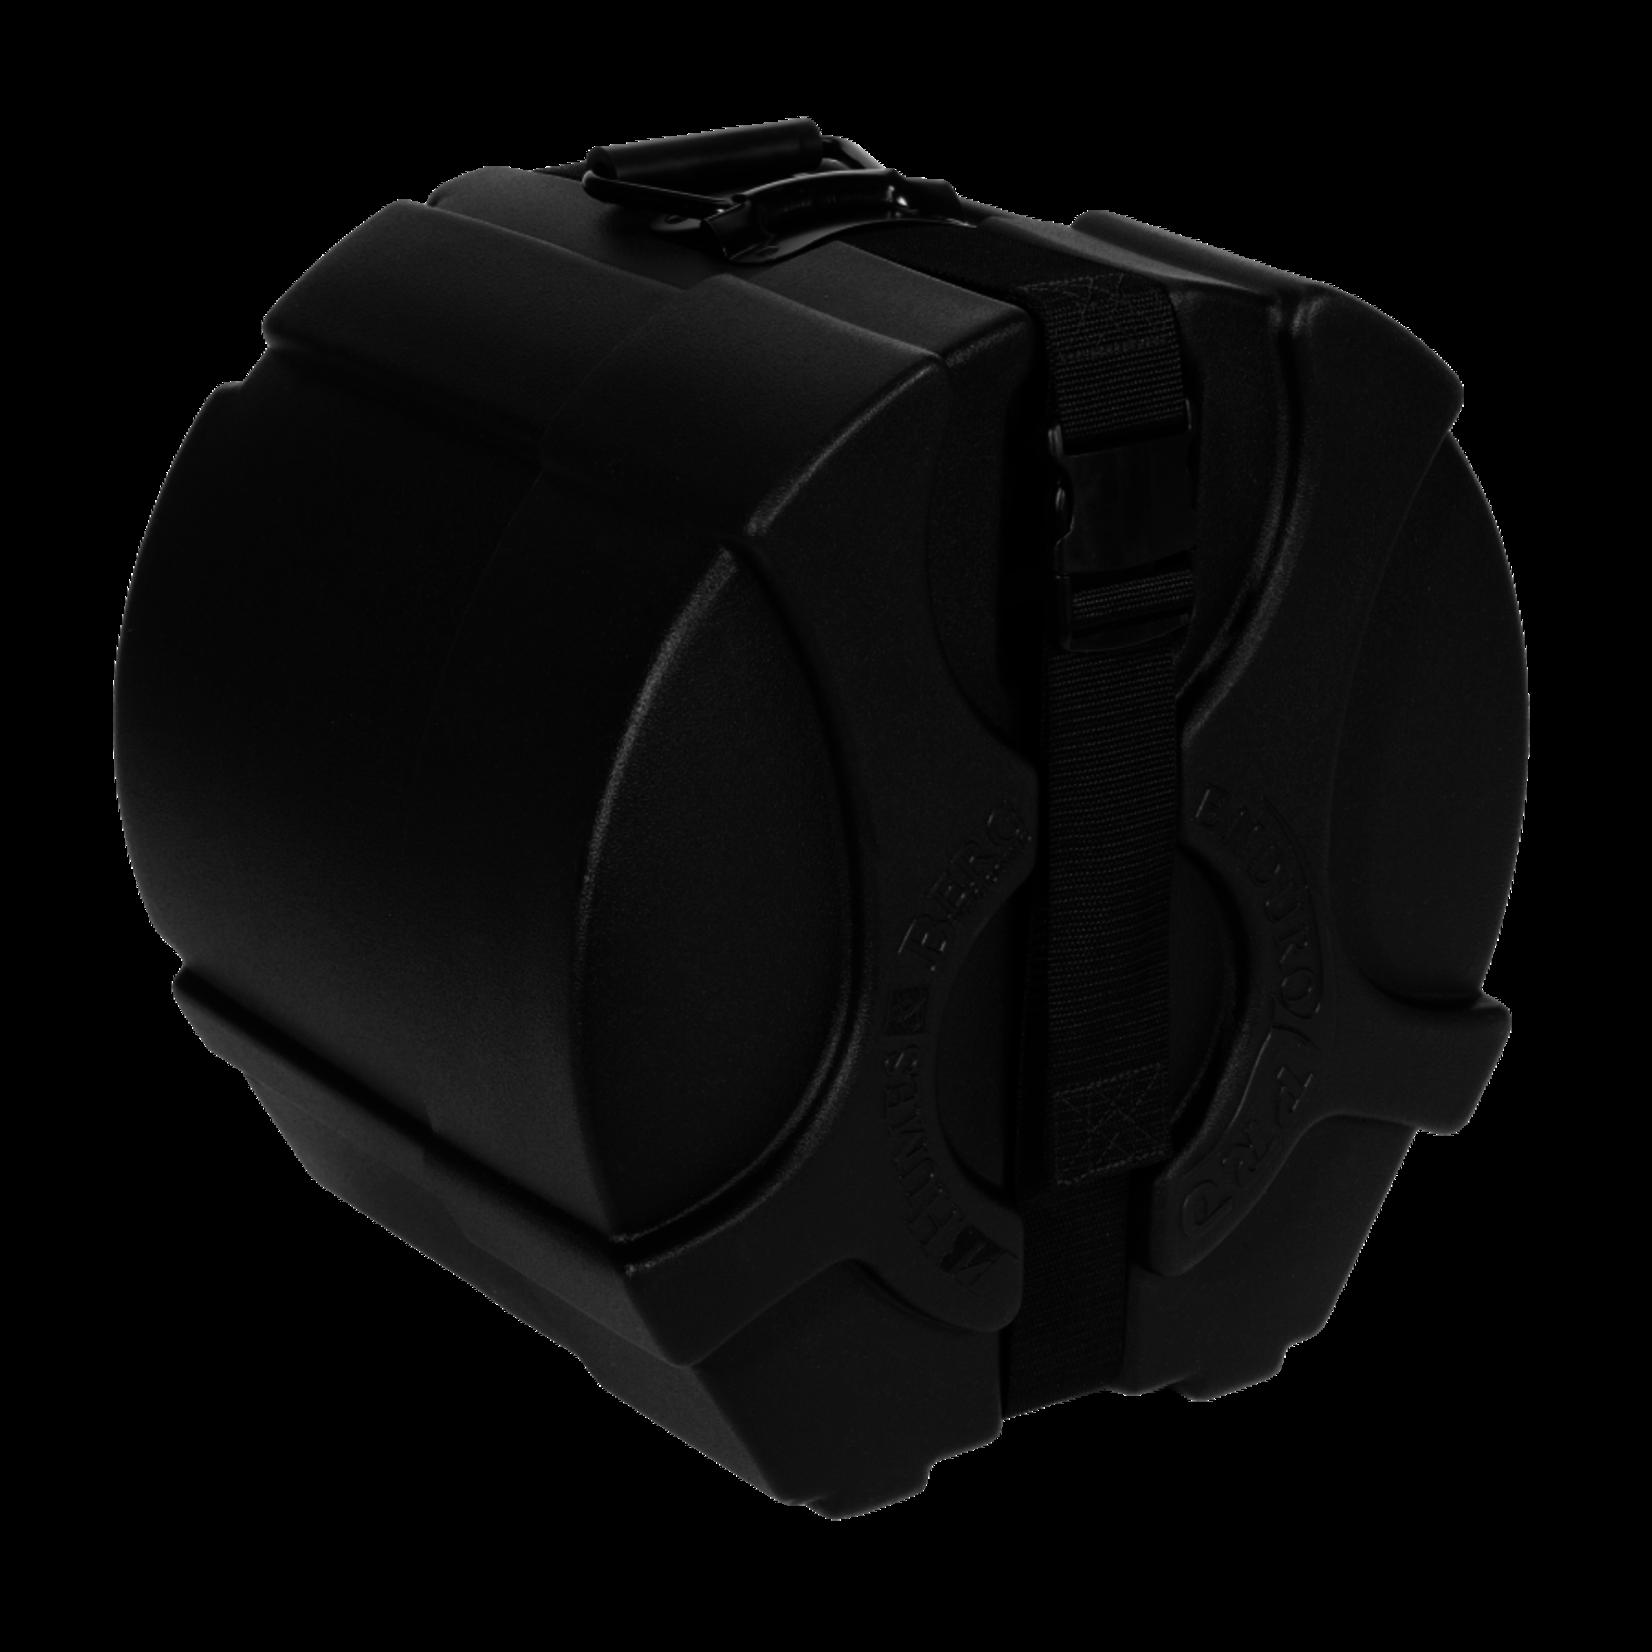 Humes and Berg Humes and Berg Enduro Pro 18x18 Black Tom Tom Case w/Foam